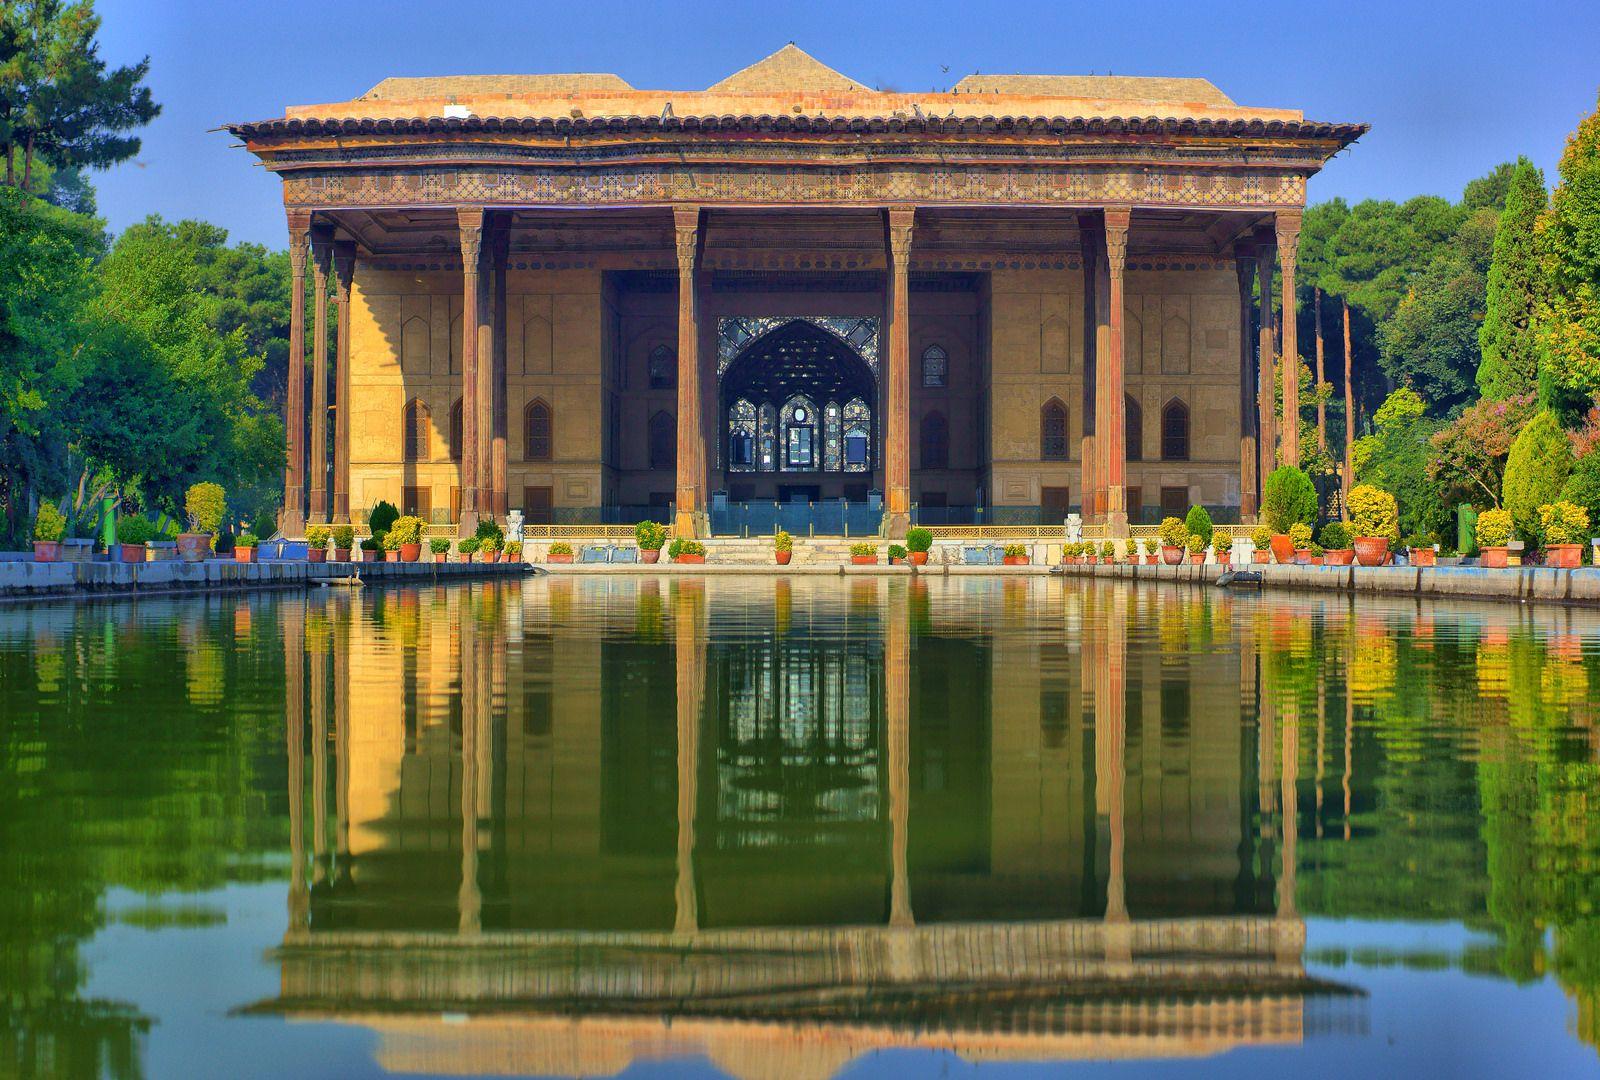 Isfahan Chehelsotoon palace